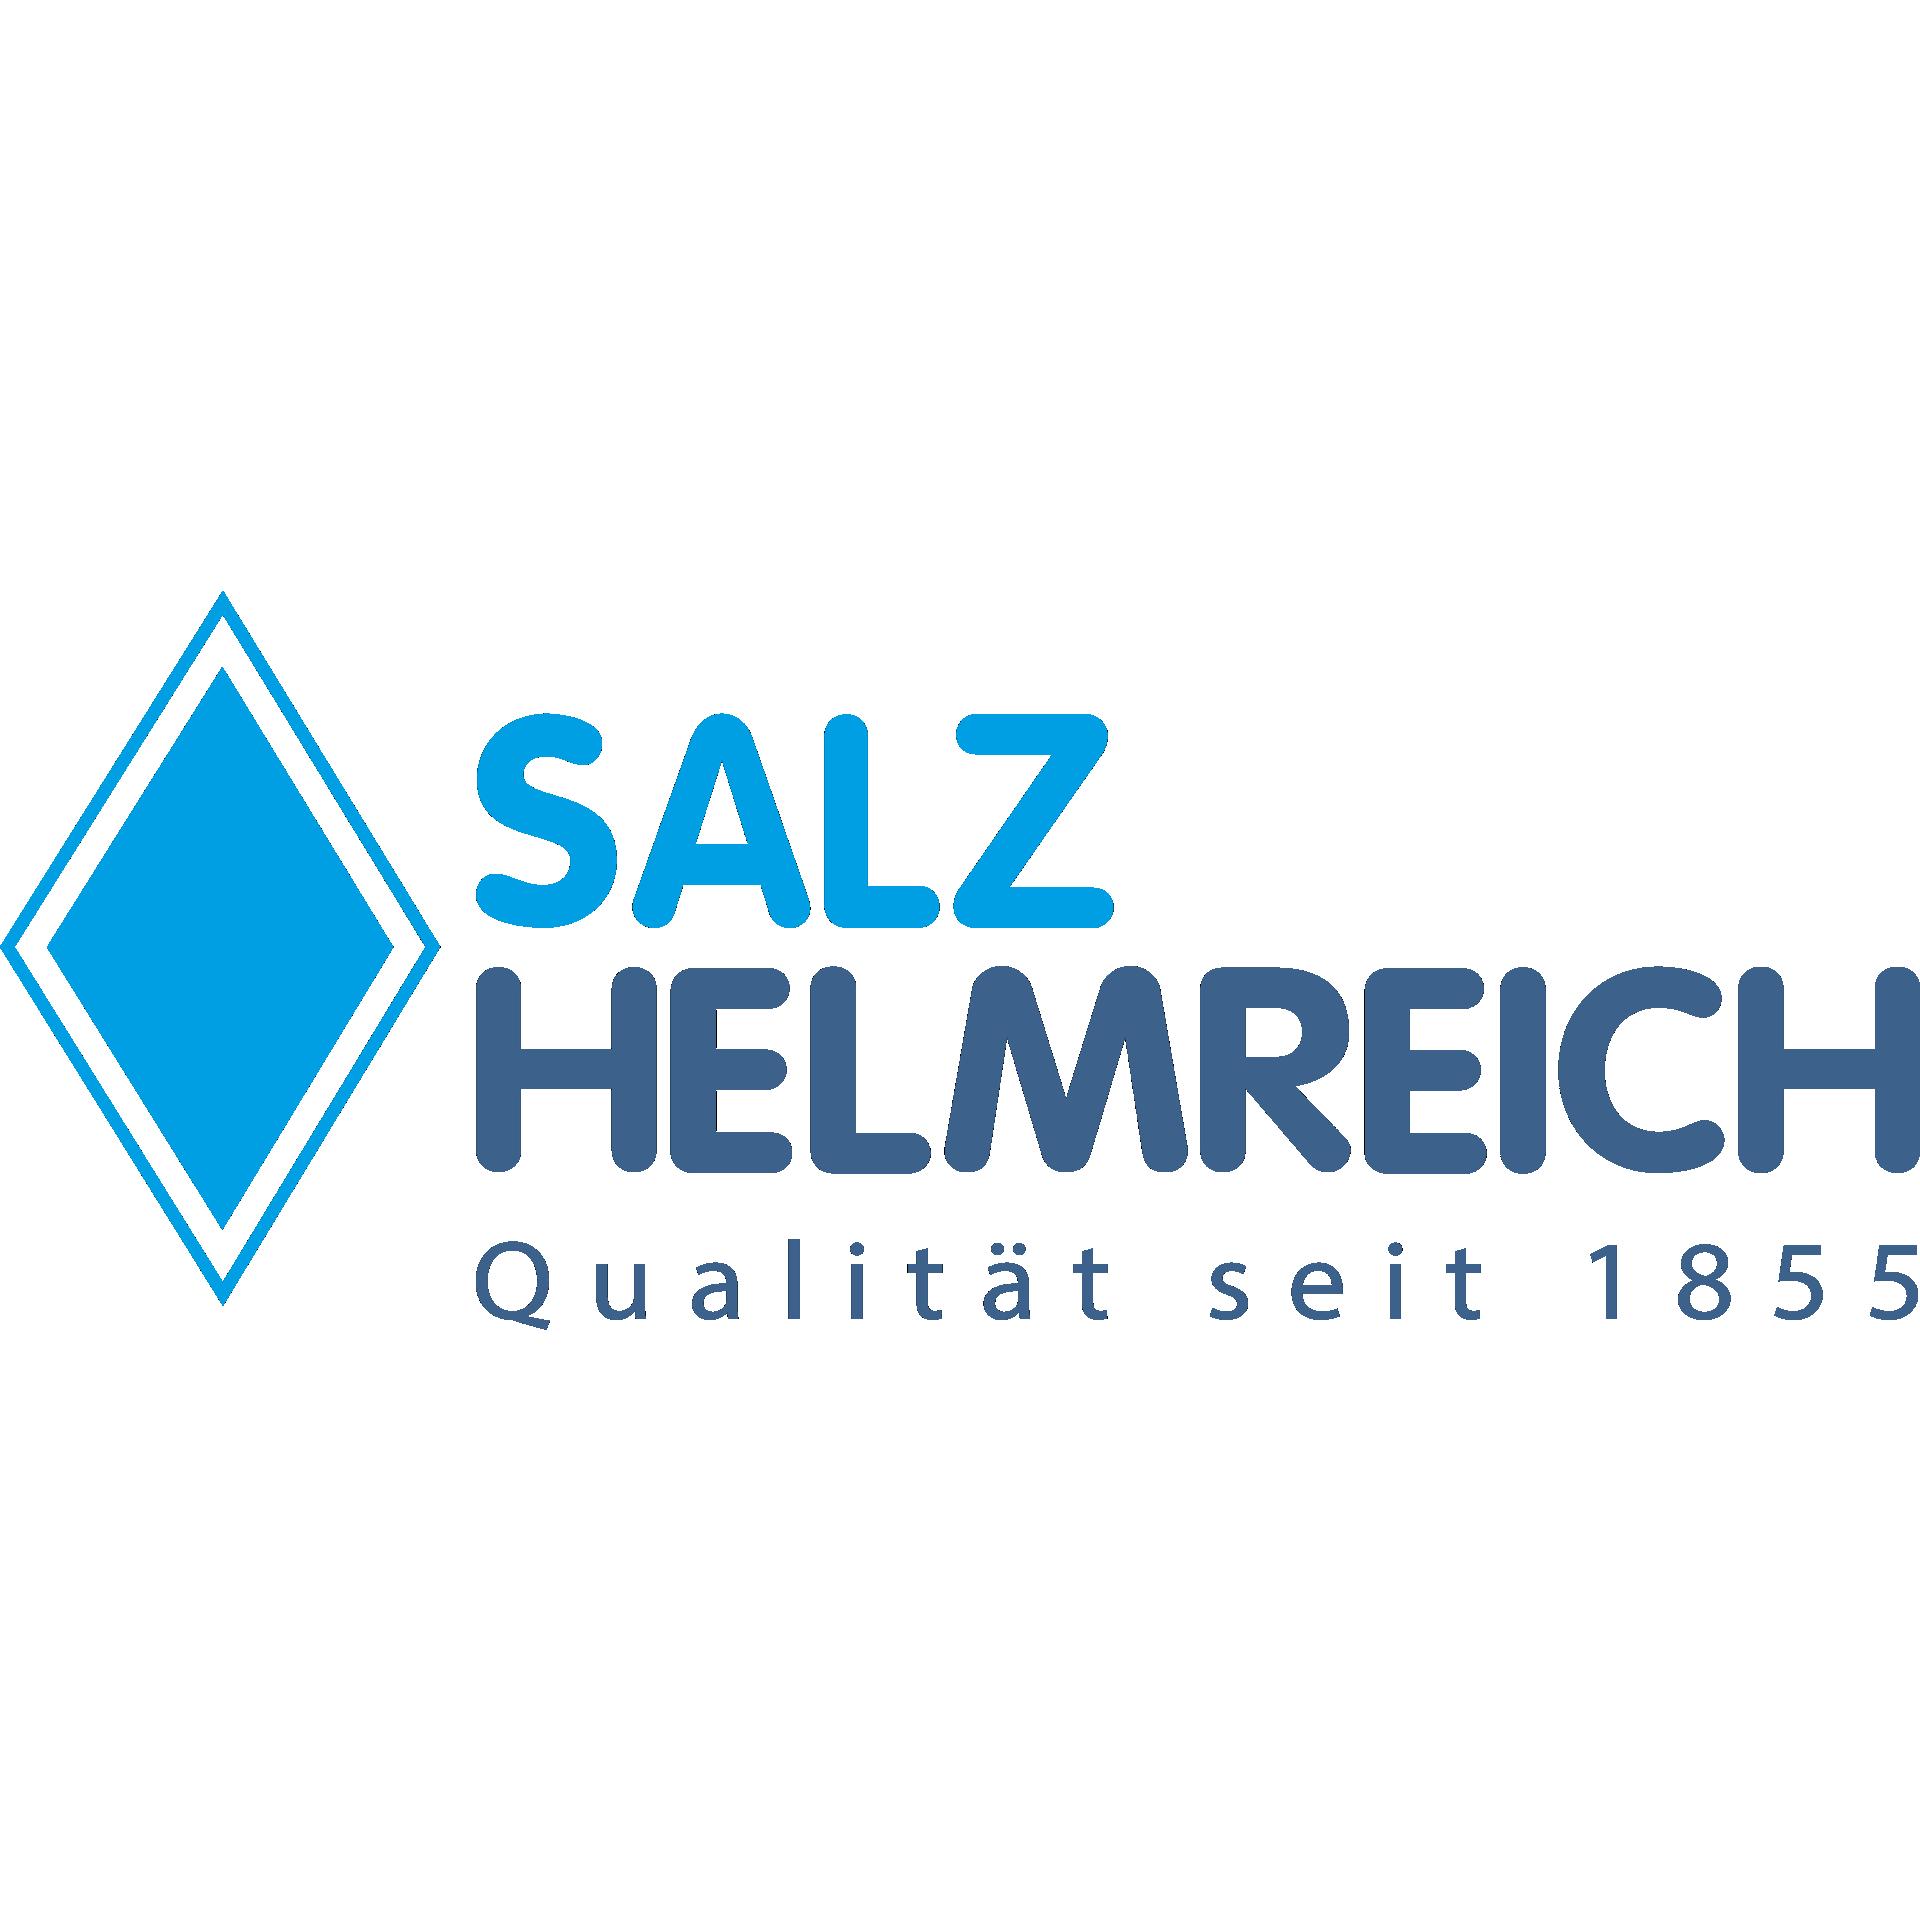 Broxo Salz-Granulat  6-15 mm nach DIN EN 973 Typ A im 25 kg Sack